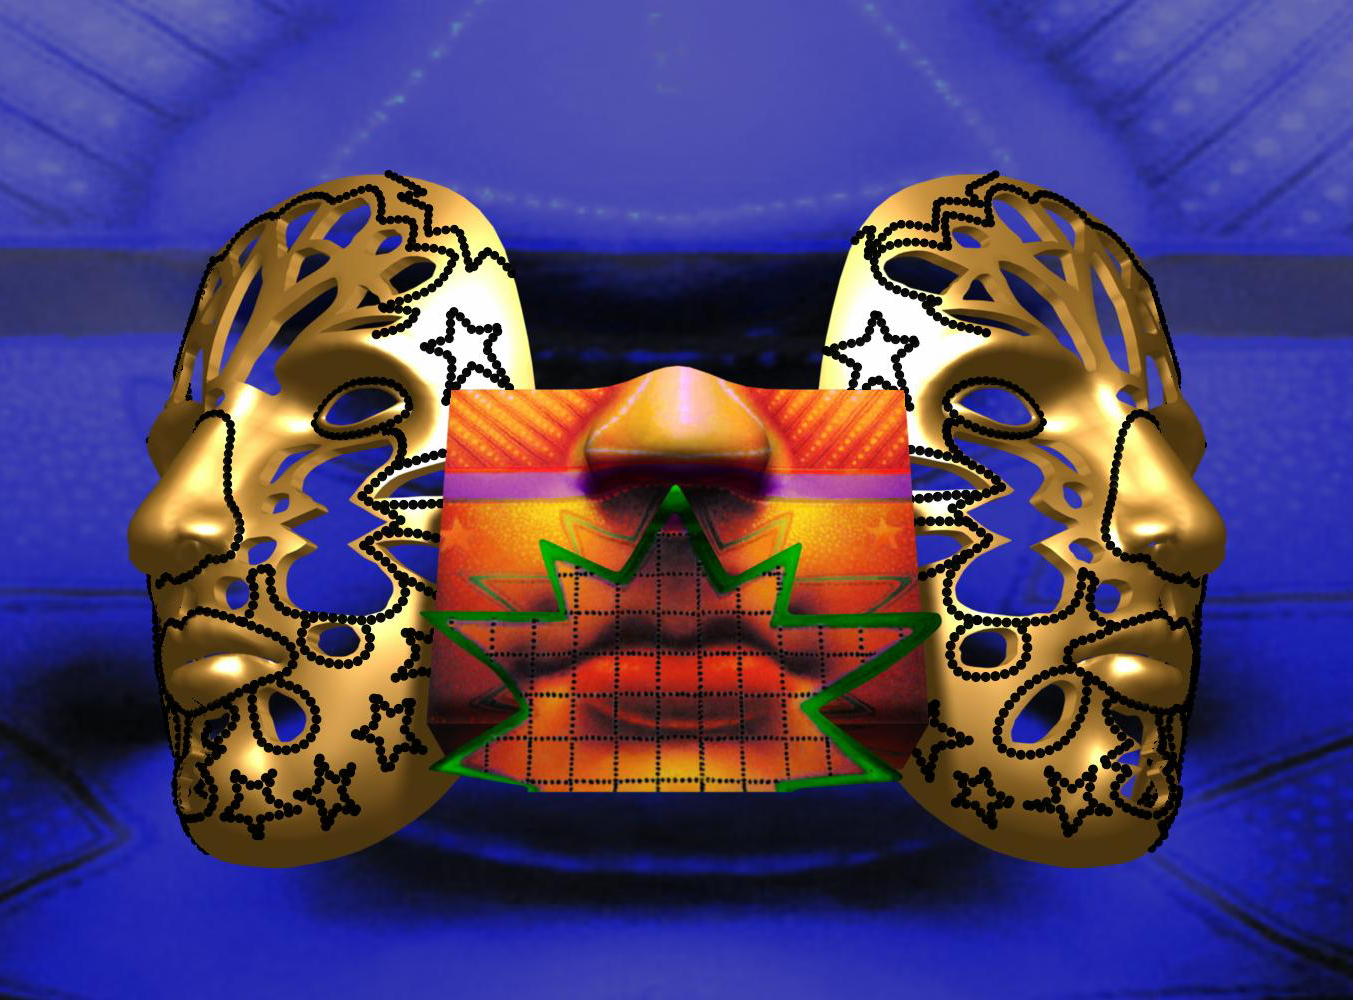 faccia d'ore: face of gold, 2002